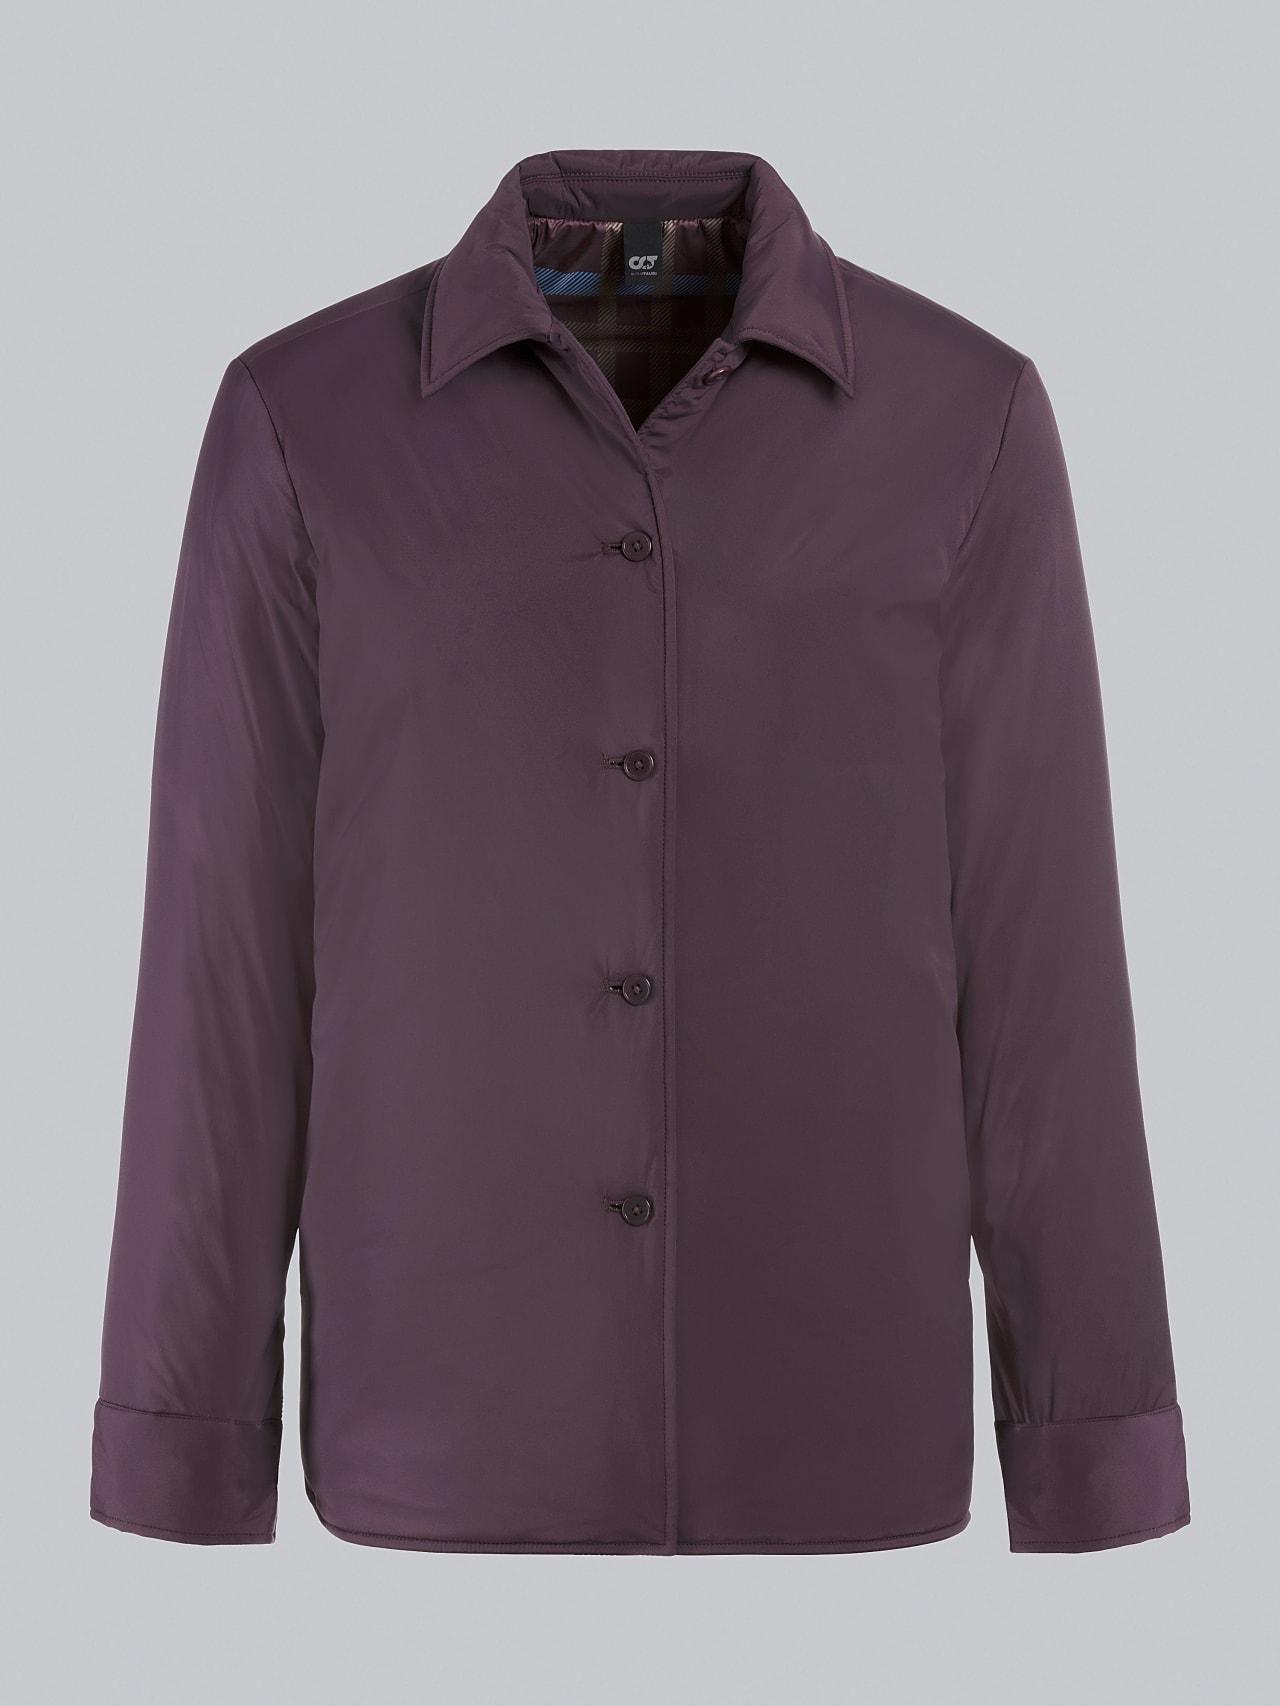 OSHEN V1.Y5.02 PrimaLoft® Overshirt Jacket Burgundy Back Alpha Tauri